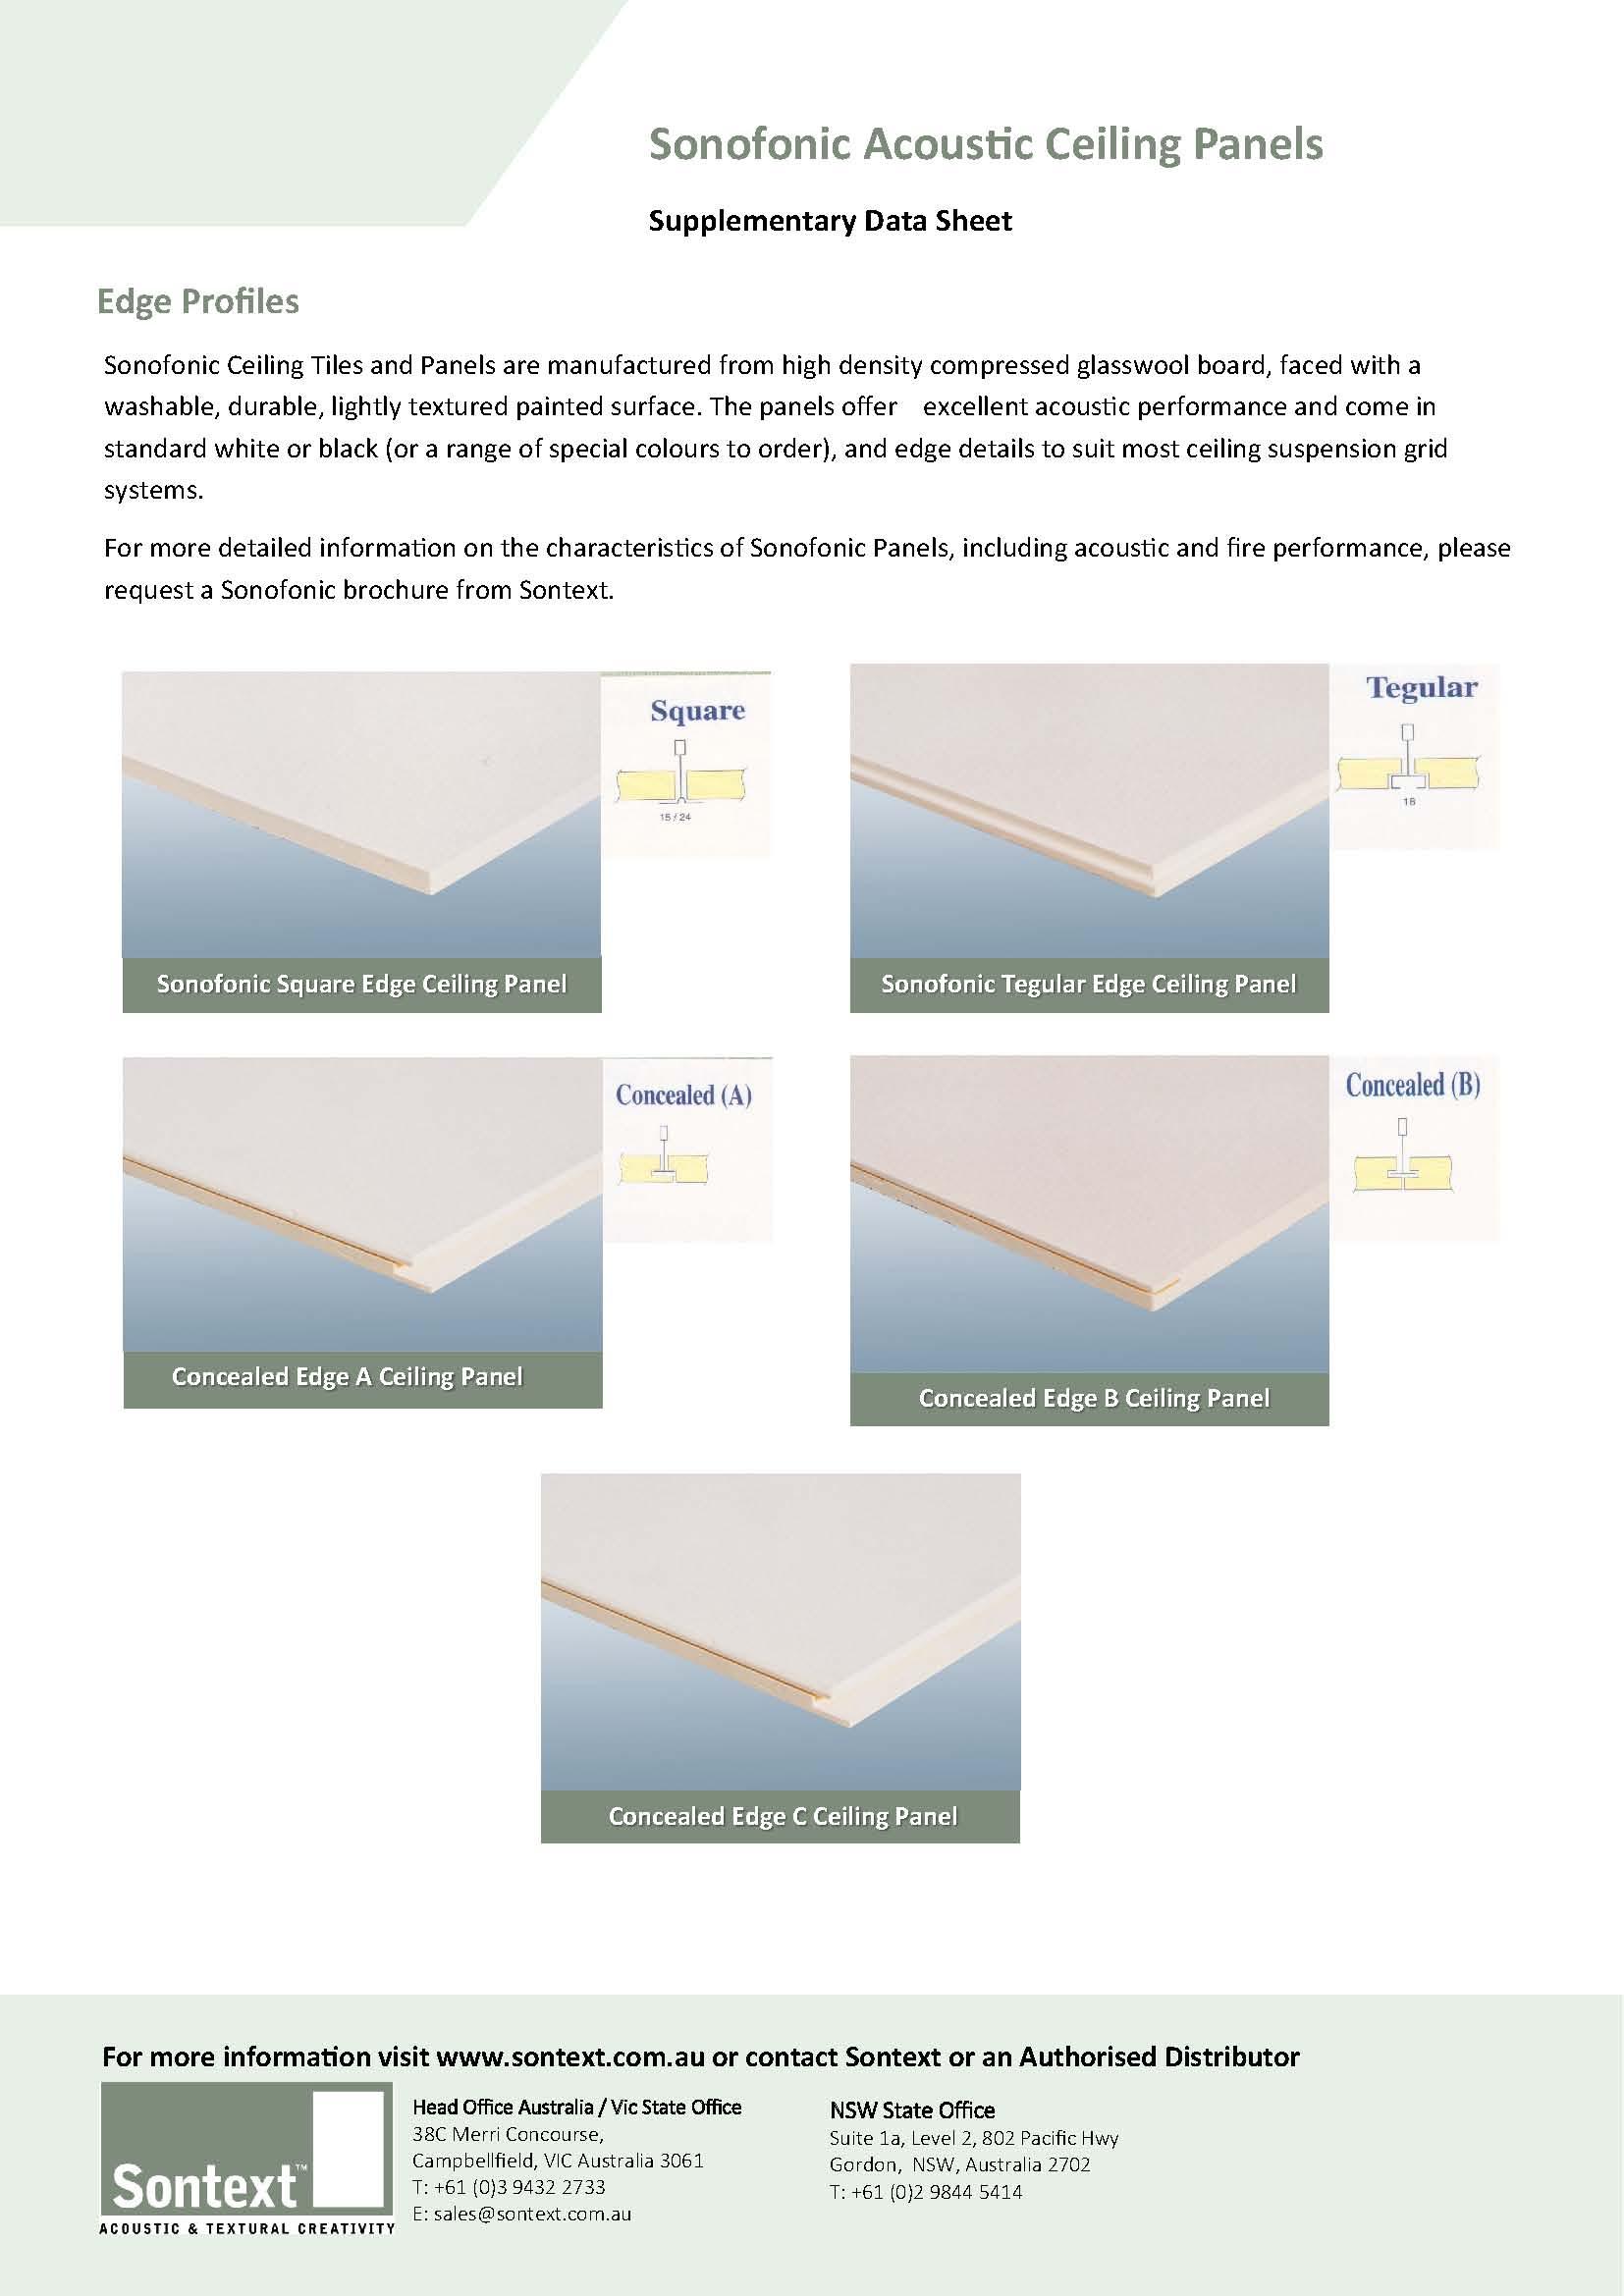 Sonofonic Edge Profiles